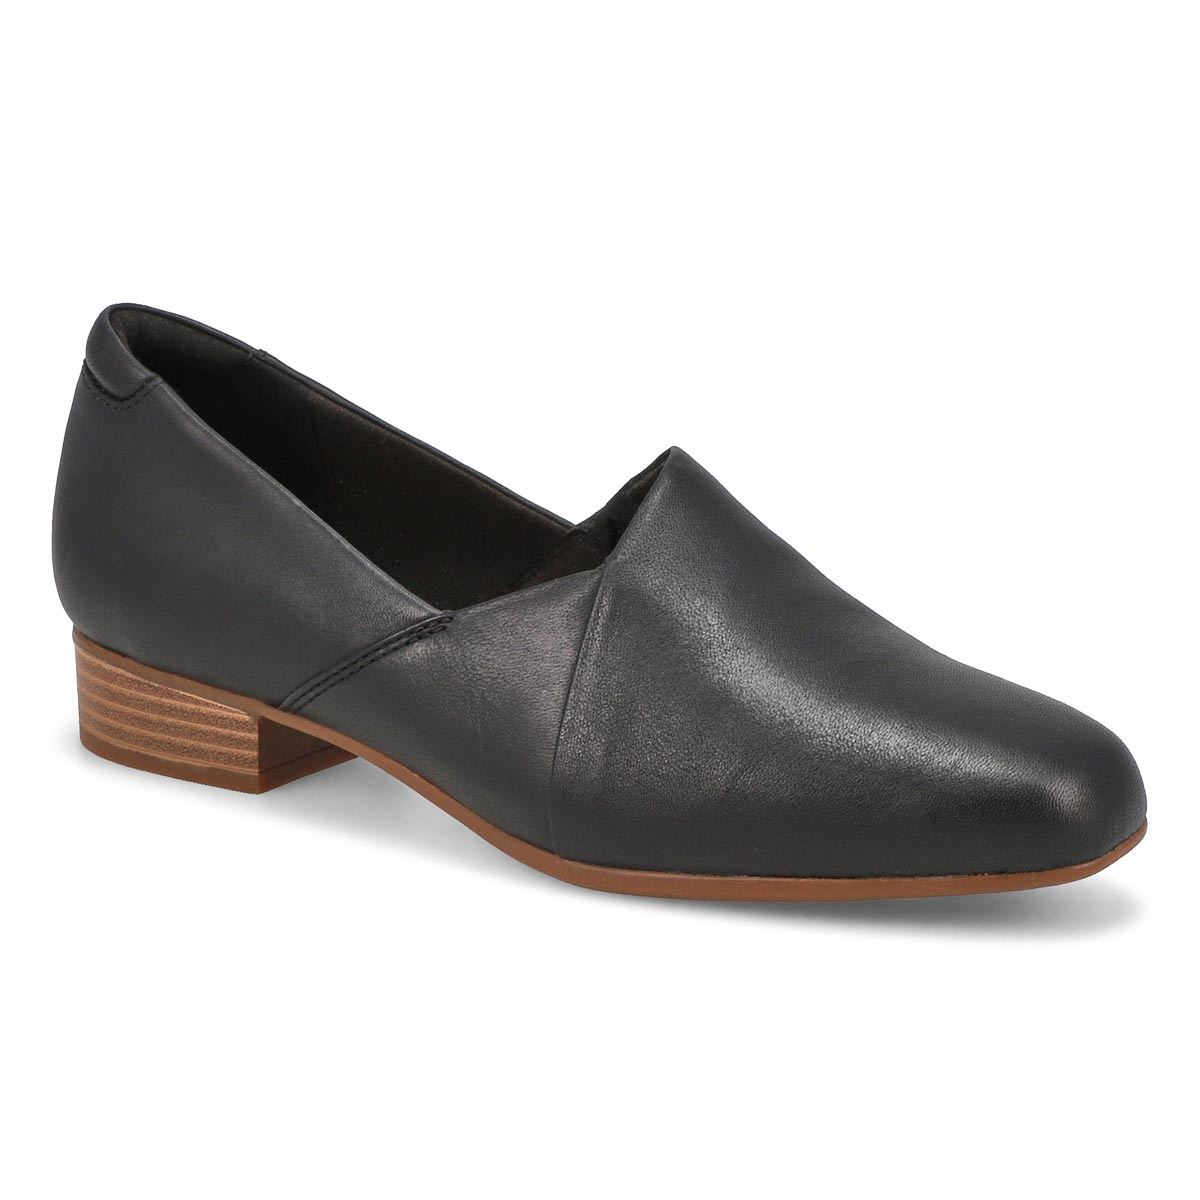 Escarpins habillés JULIET PALM, noir, femmes